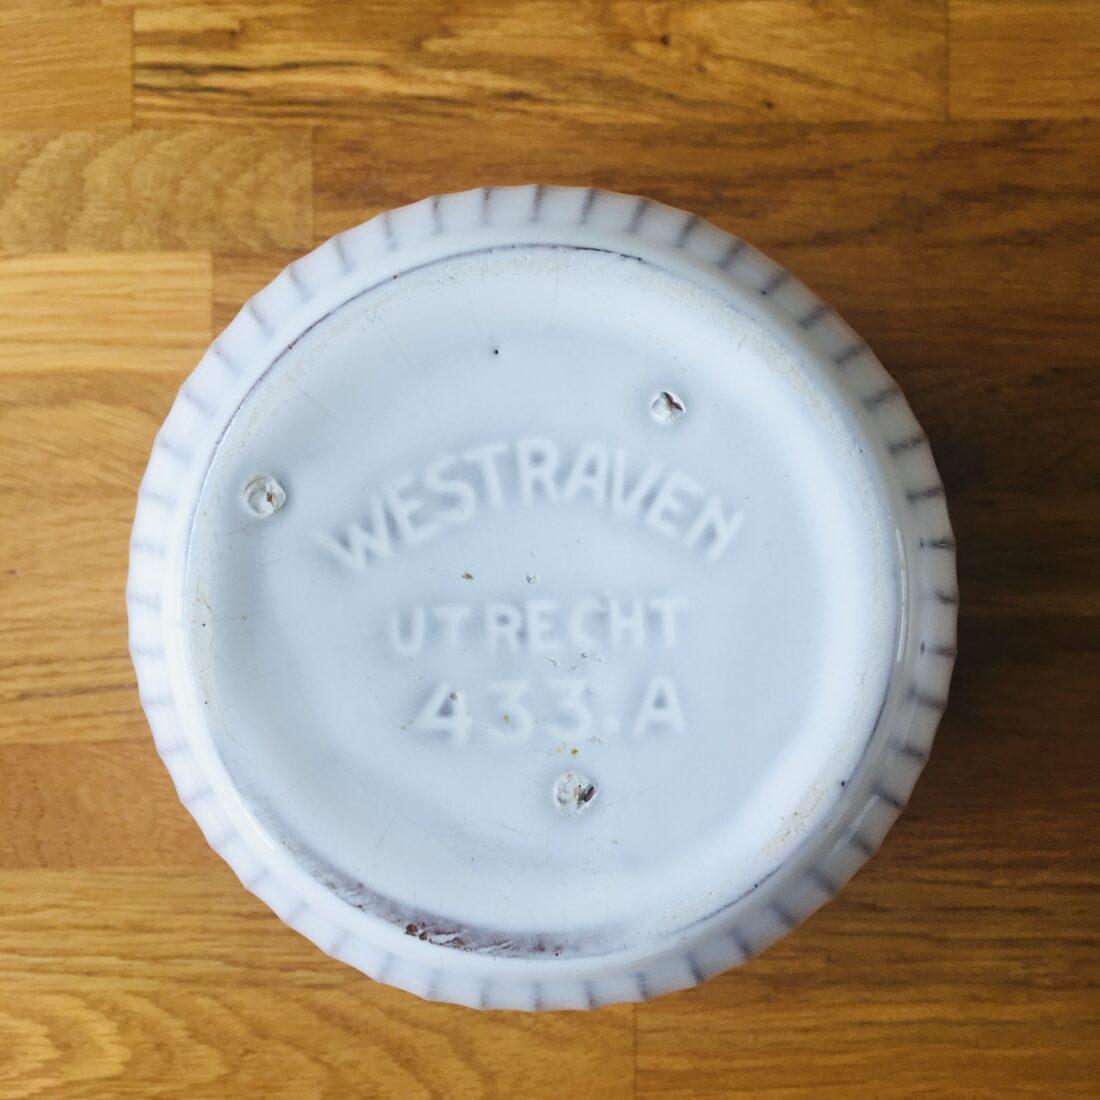 Vintage Westraven bloempot